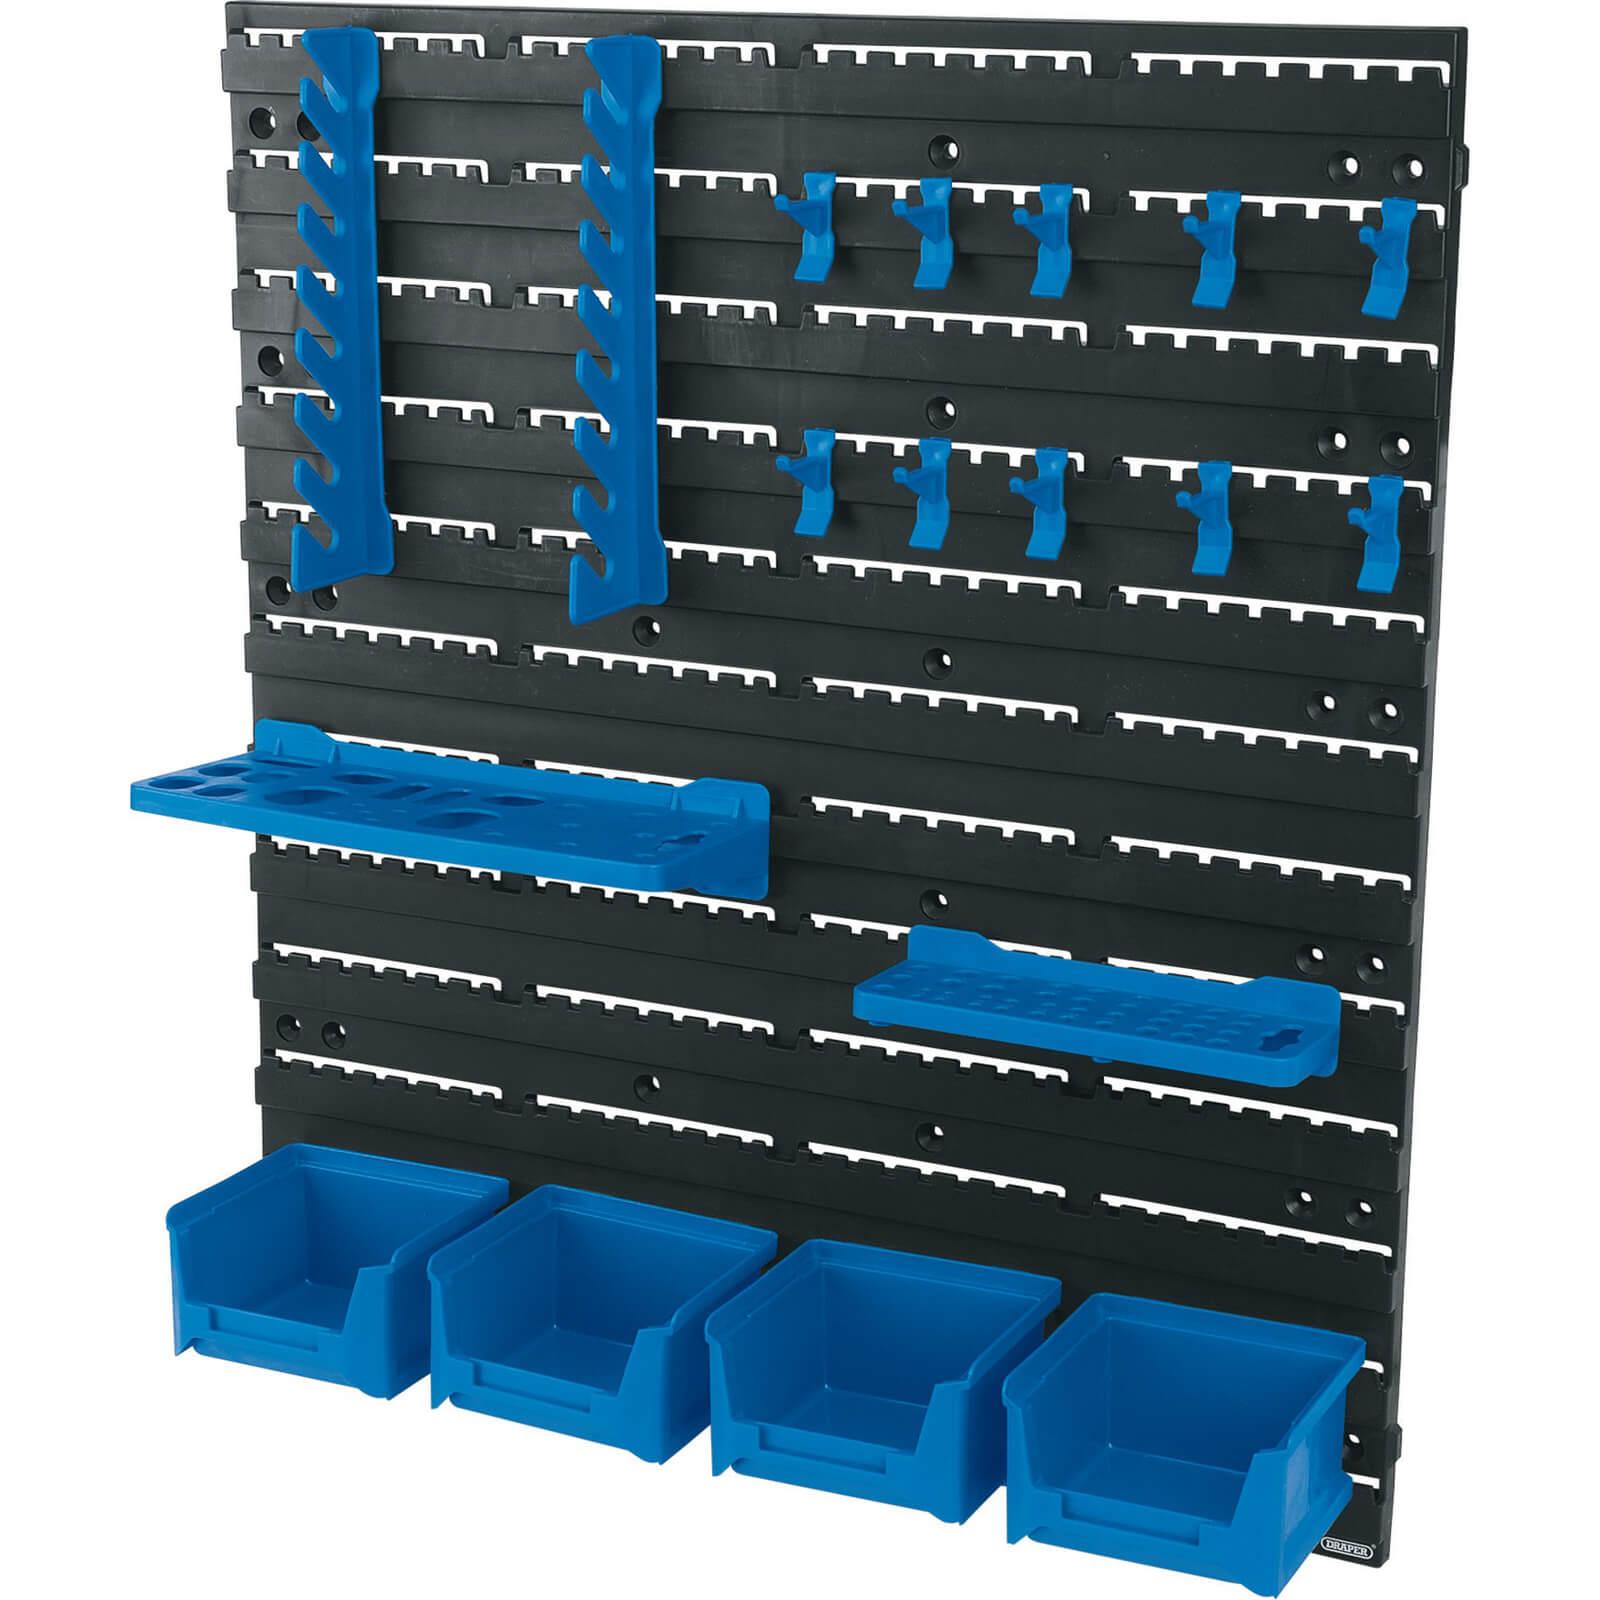 Image of Draper 18 Piece Wall Mounted Tool Storage Board